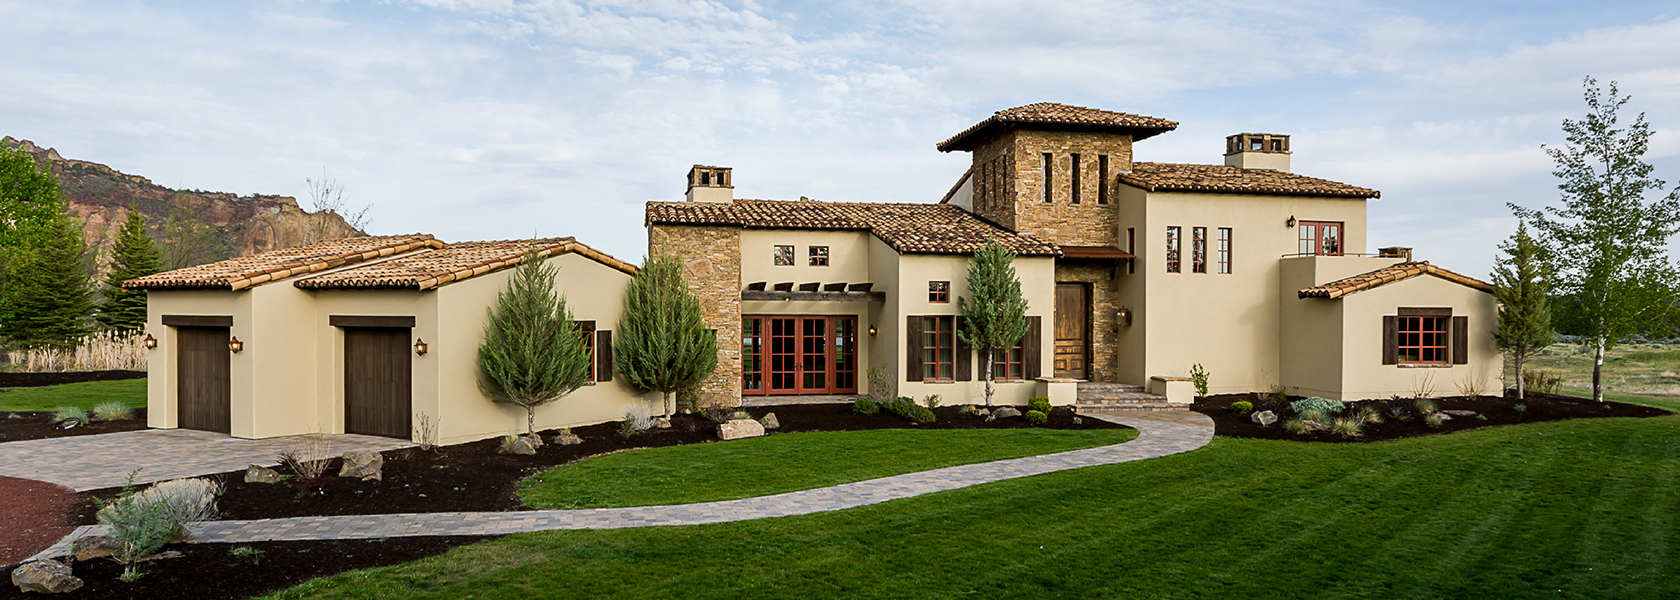 Real Estate Development Services : Real estate development services vancouver wa ginn